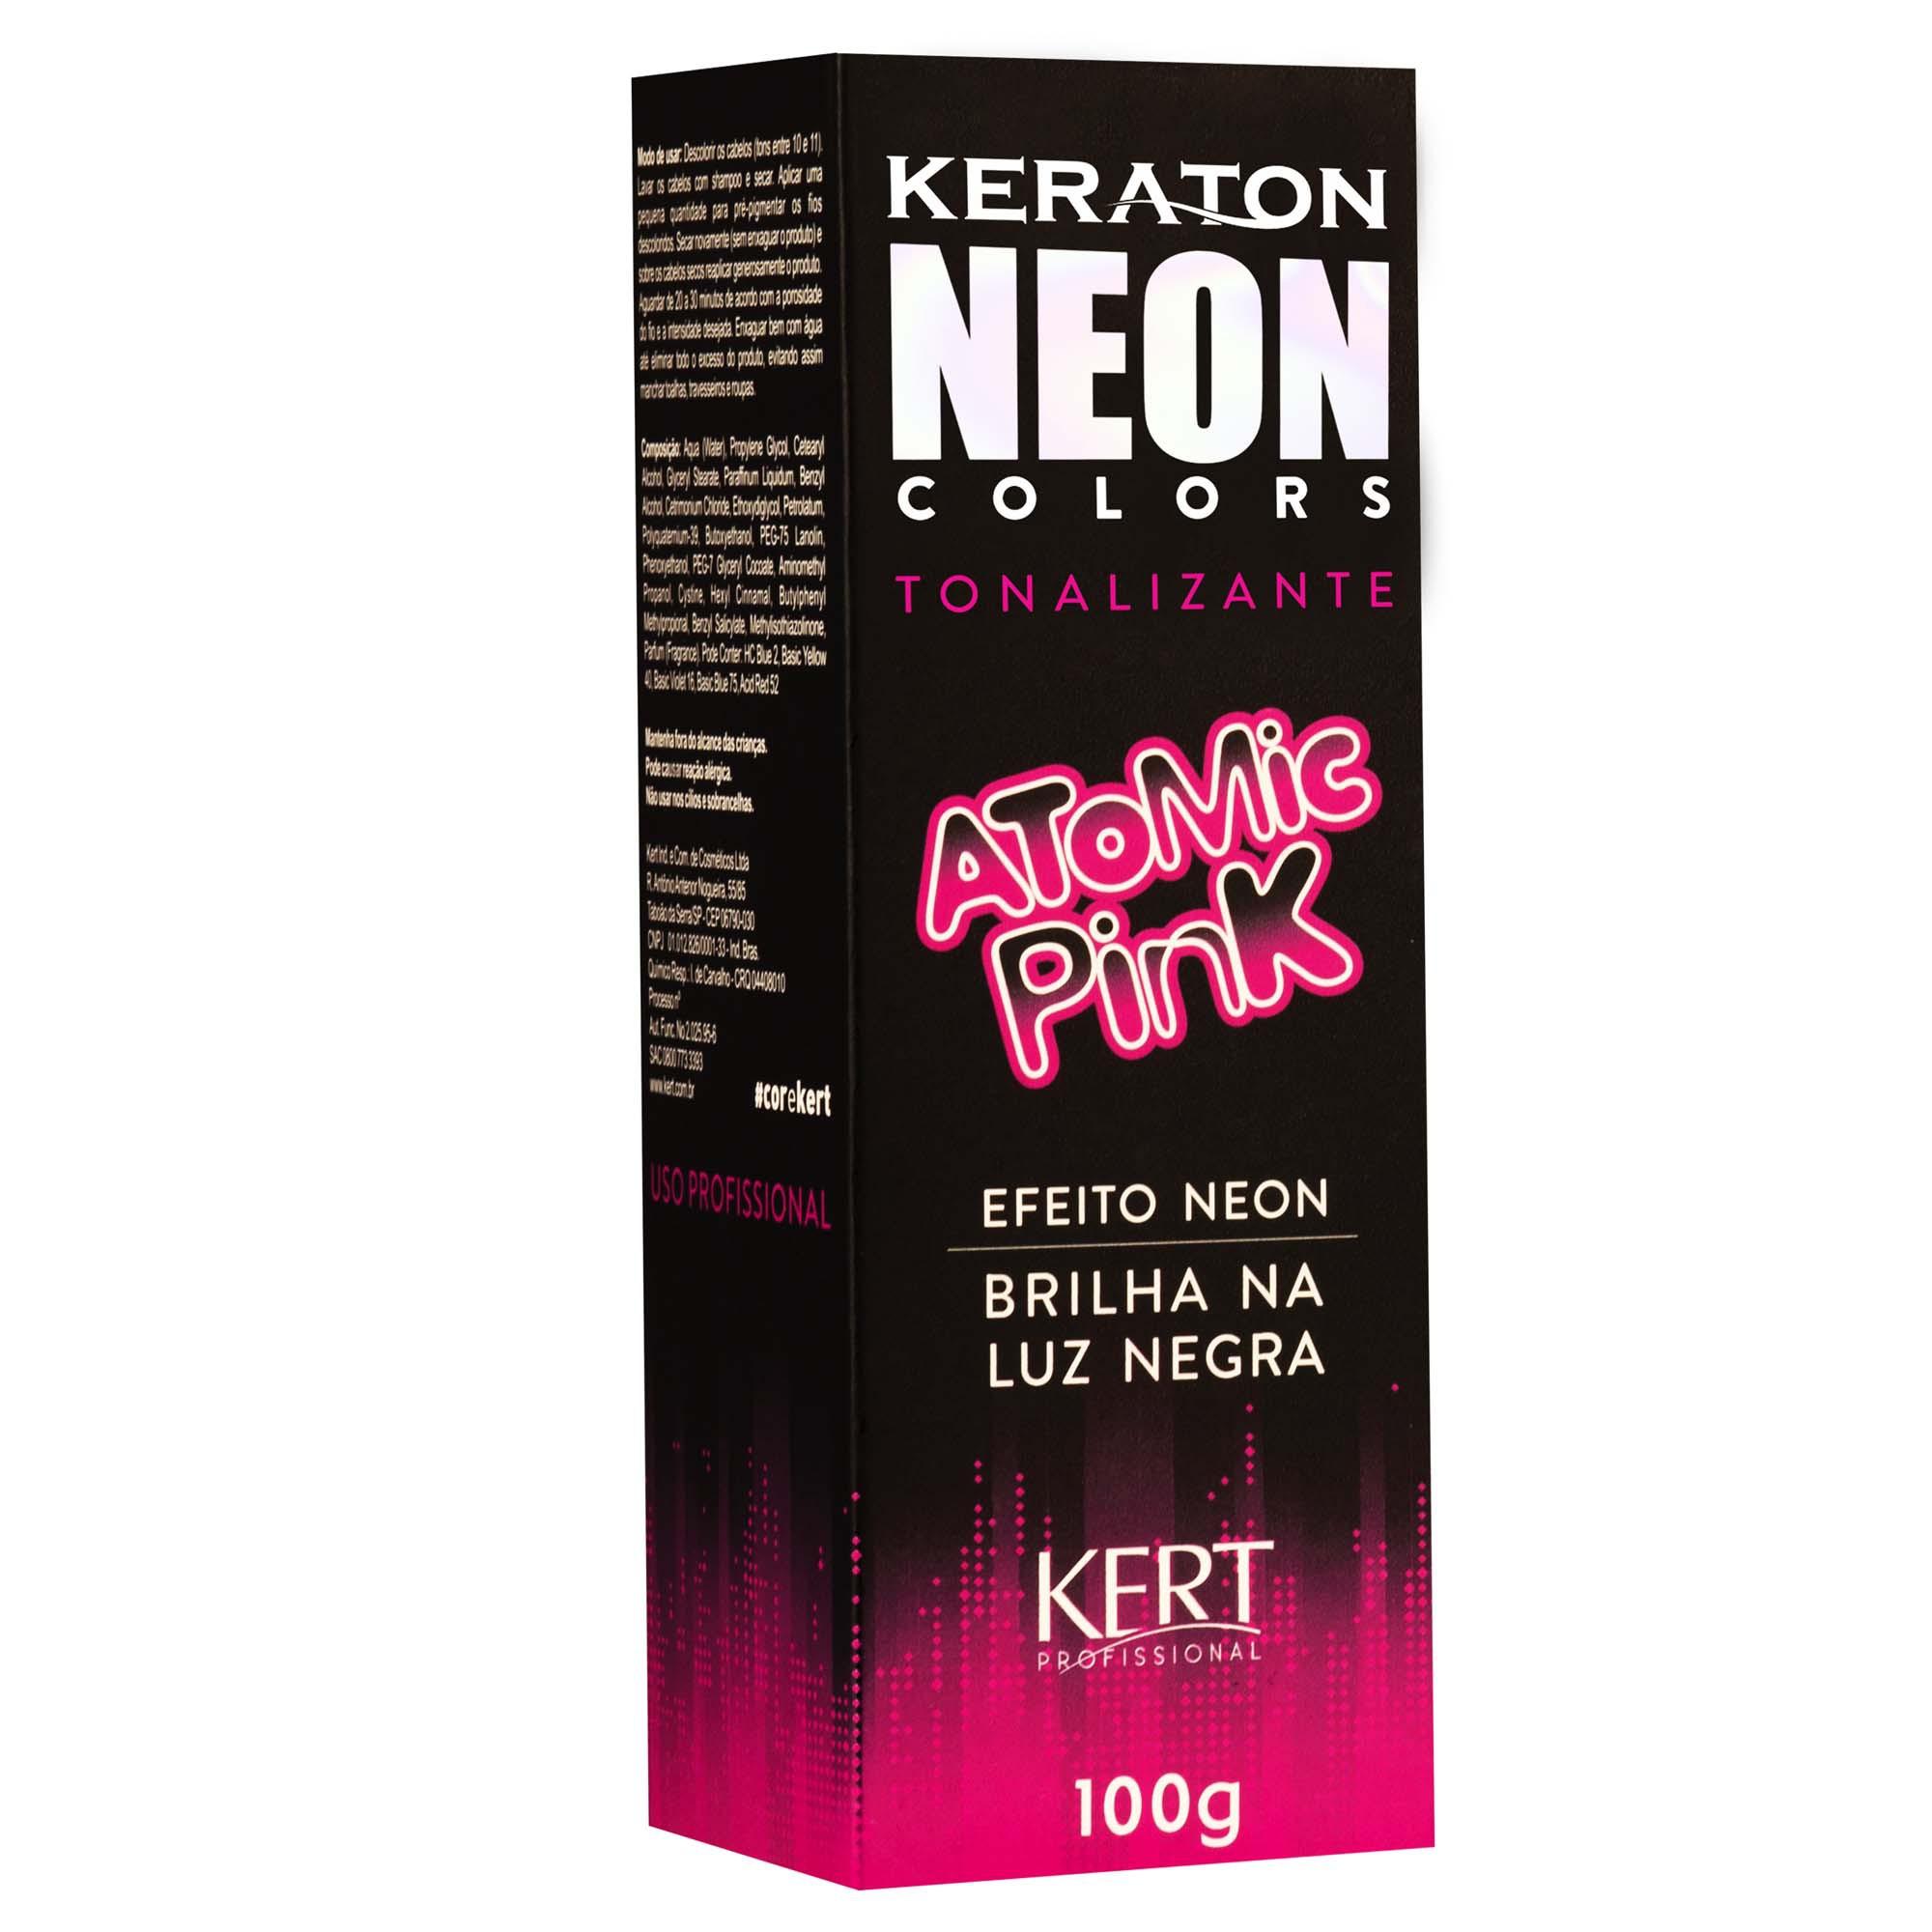 Kert Keraton Neon Colors Tonalizante Cor Atomic Pink  - 100g